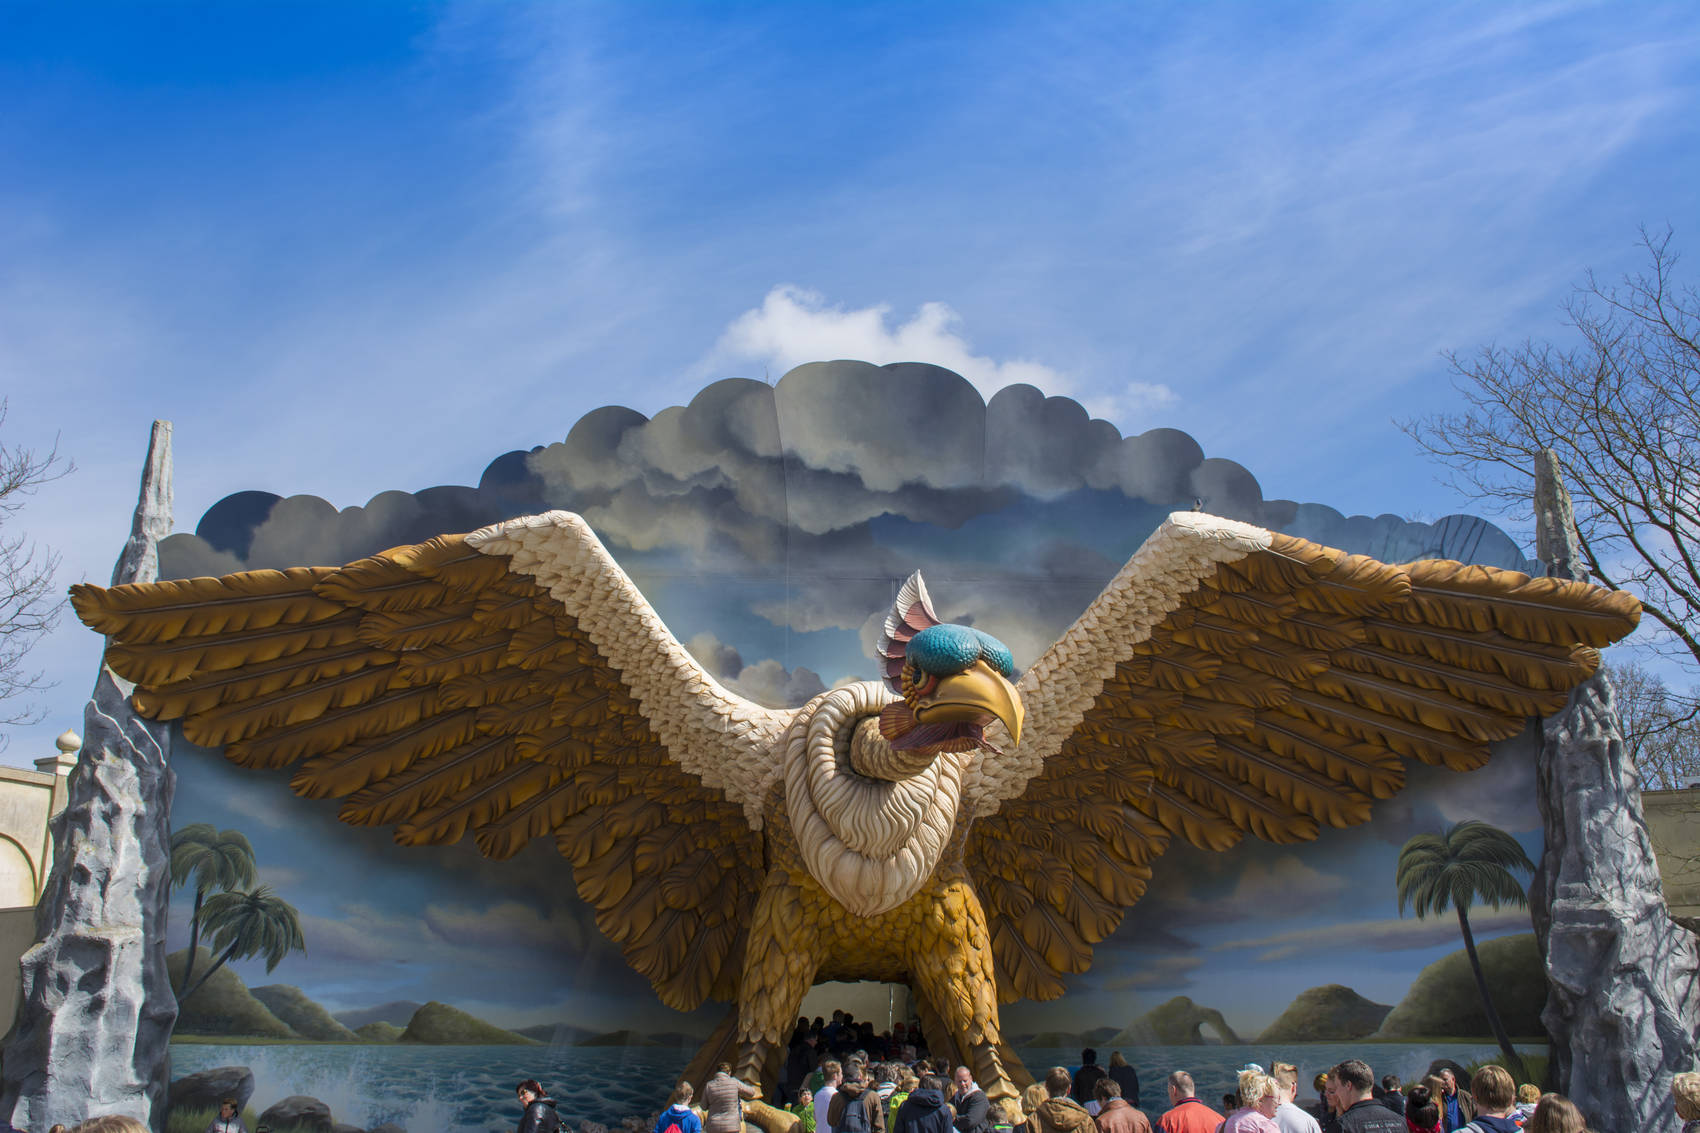 holland-eagle-ride-theme-park